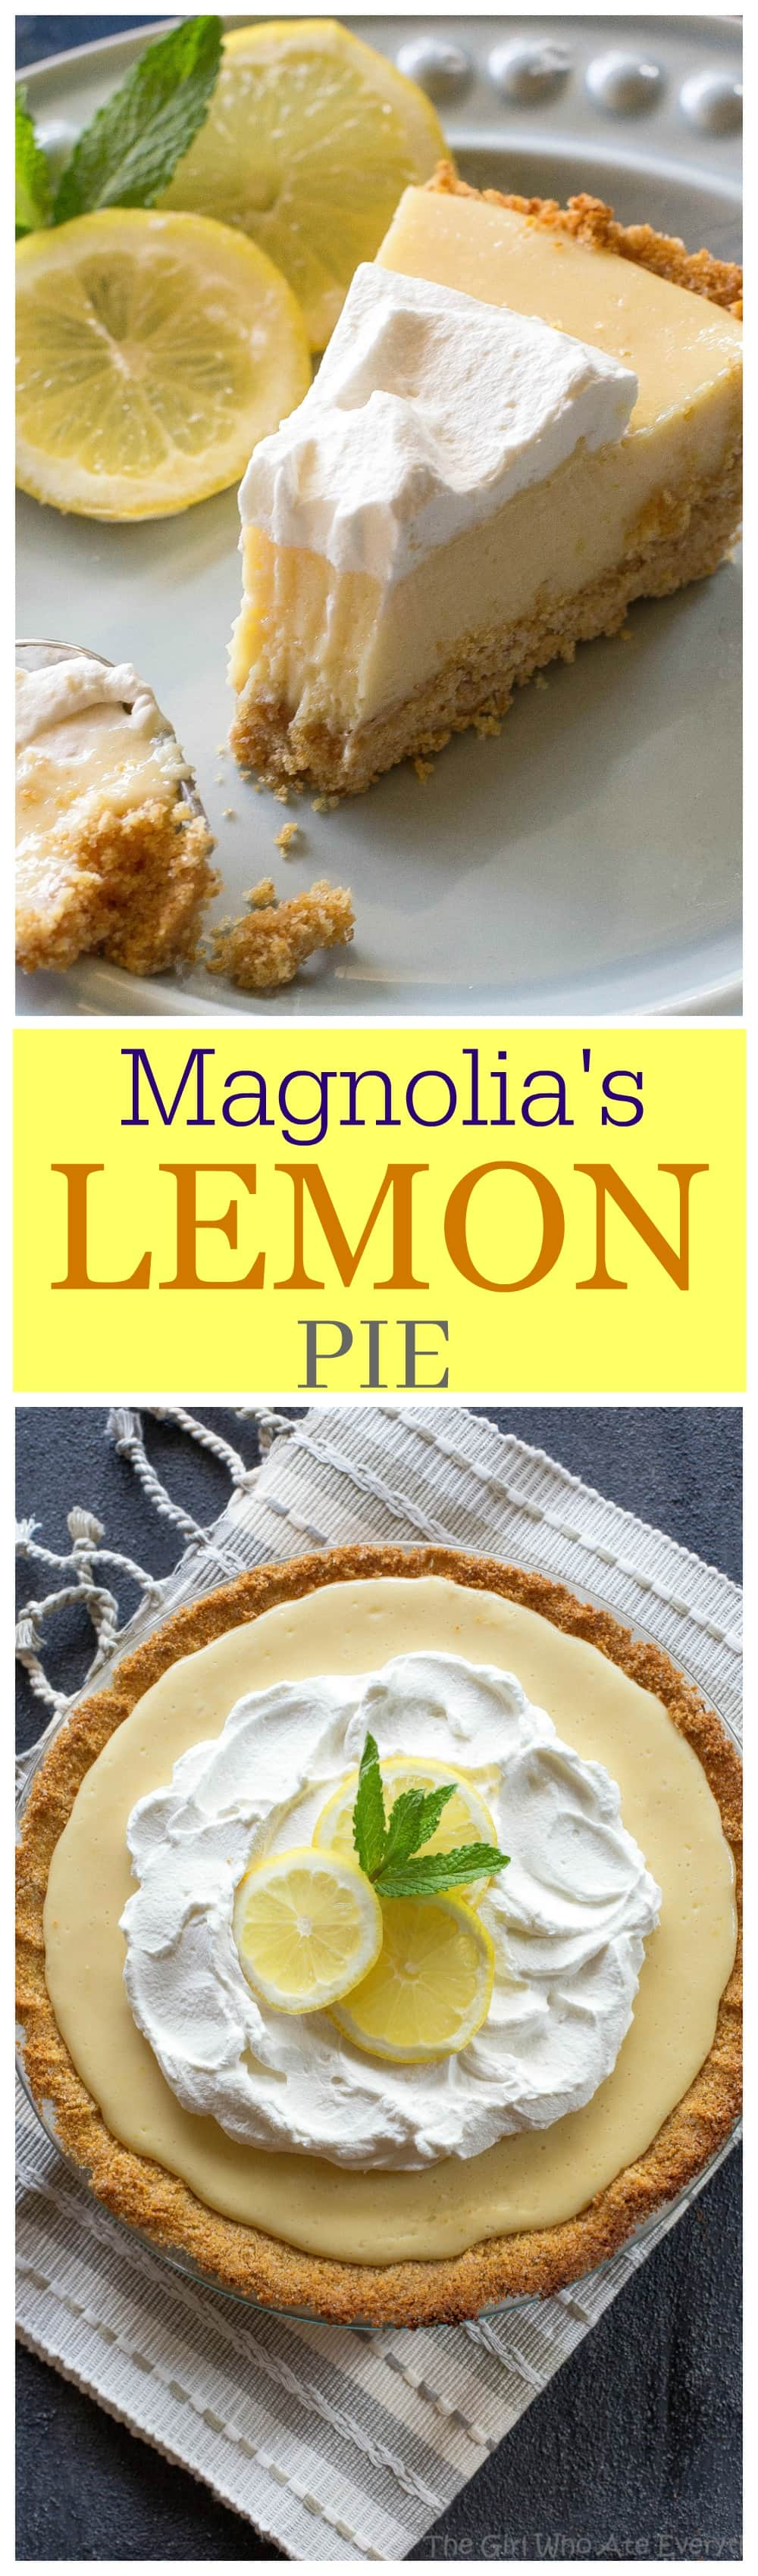 Lemon Pie - light, sweet and tart lemon pie with a thick graham cracker crust. From Joanna Gaines from Magnolia Market! #easy #lemon #pie #dessert